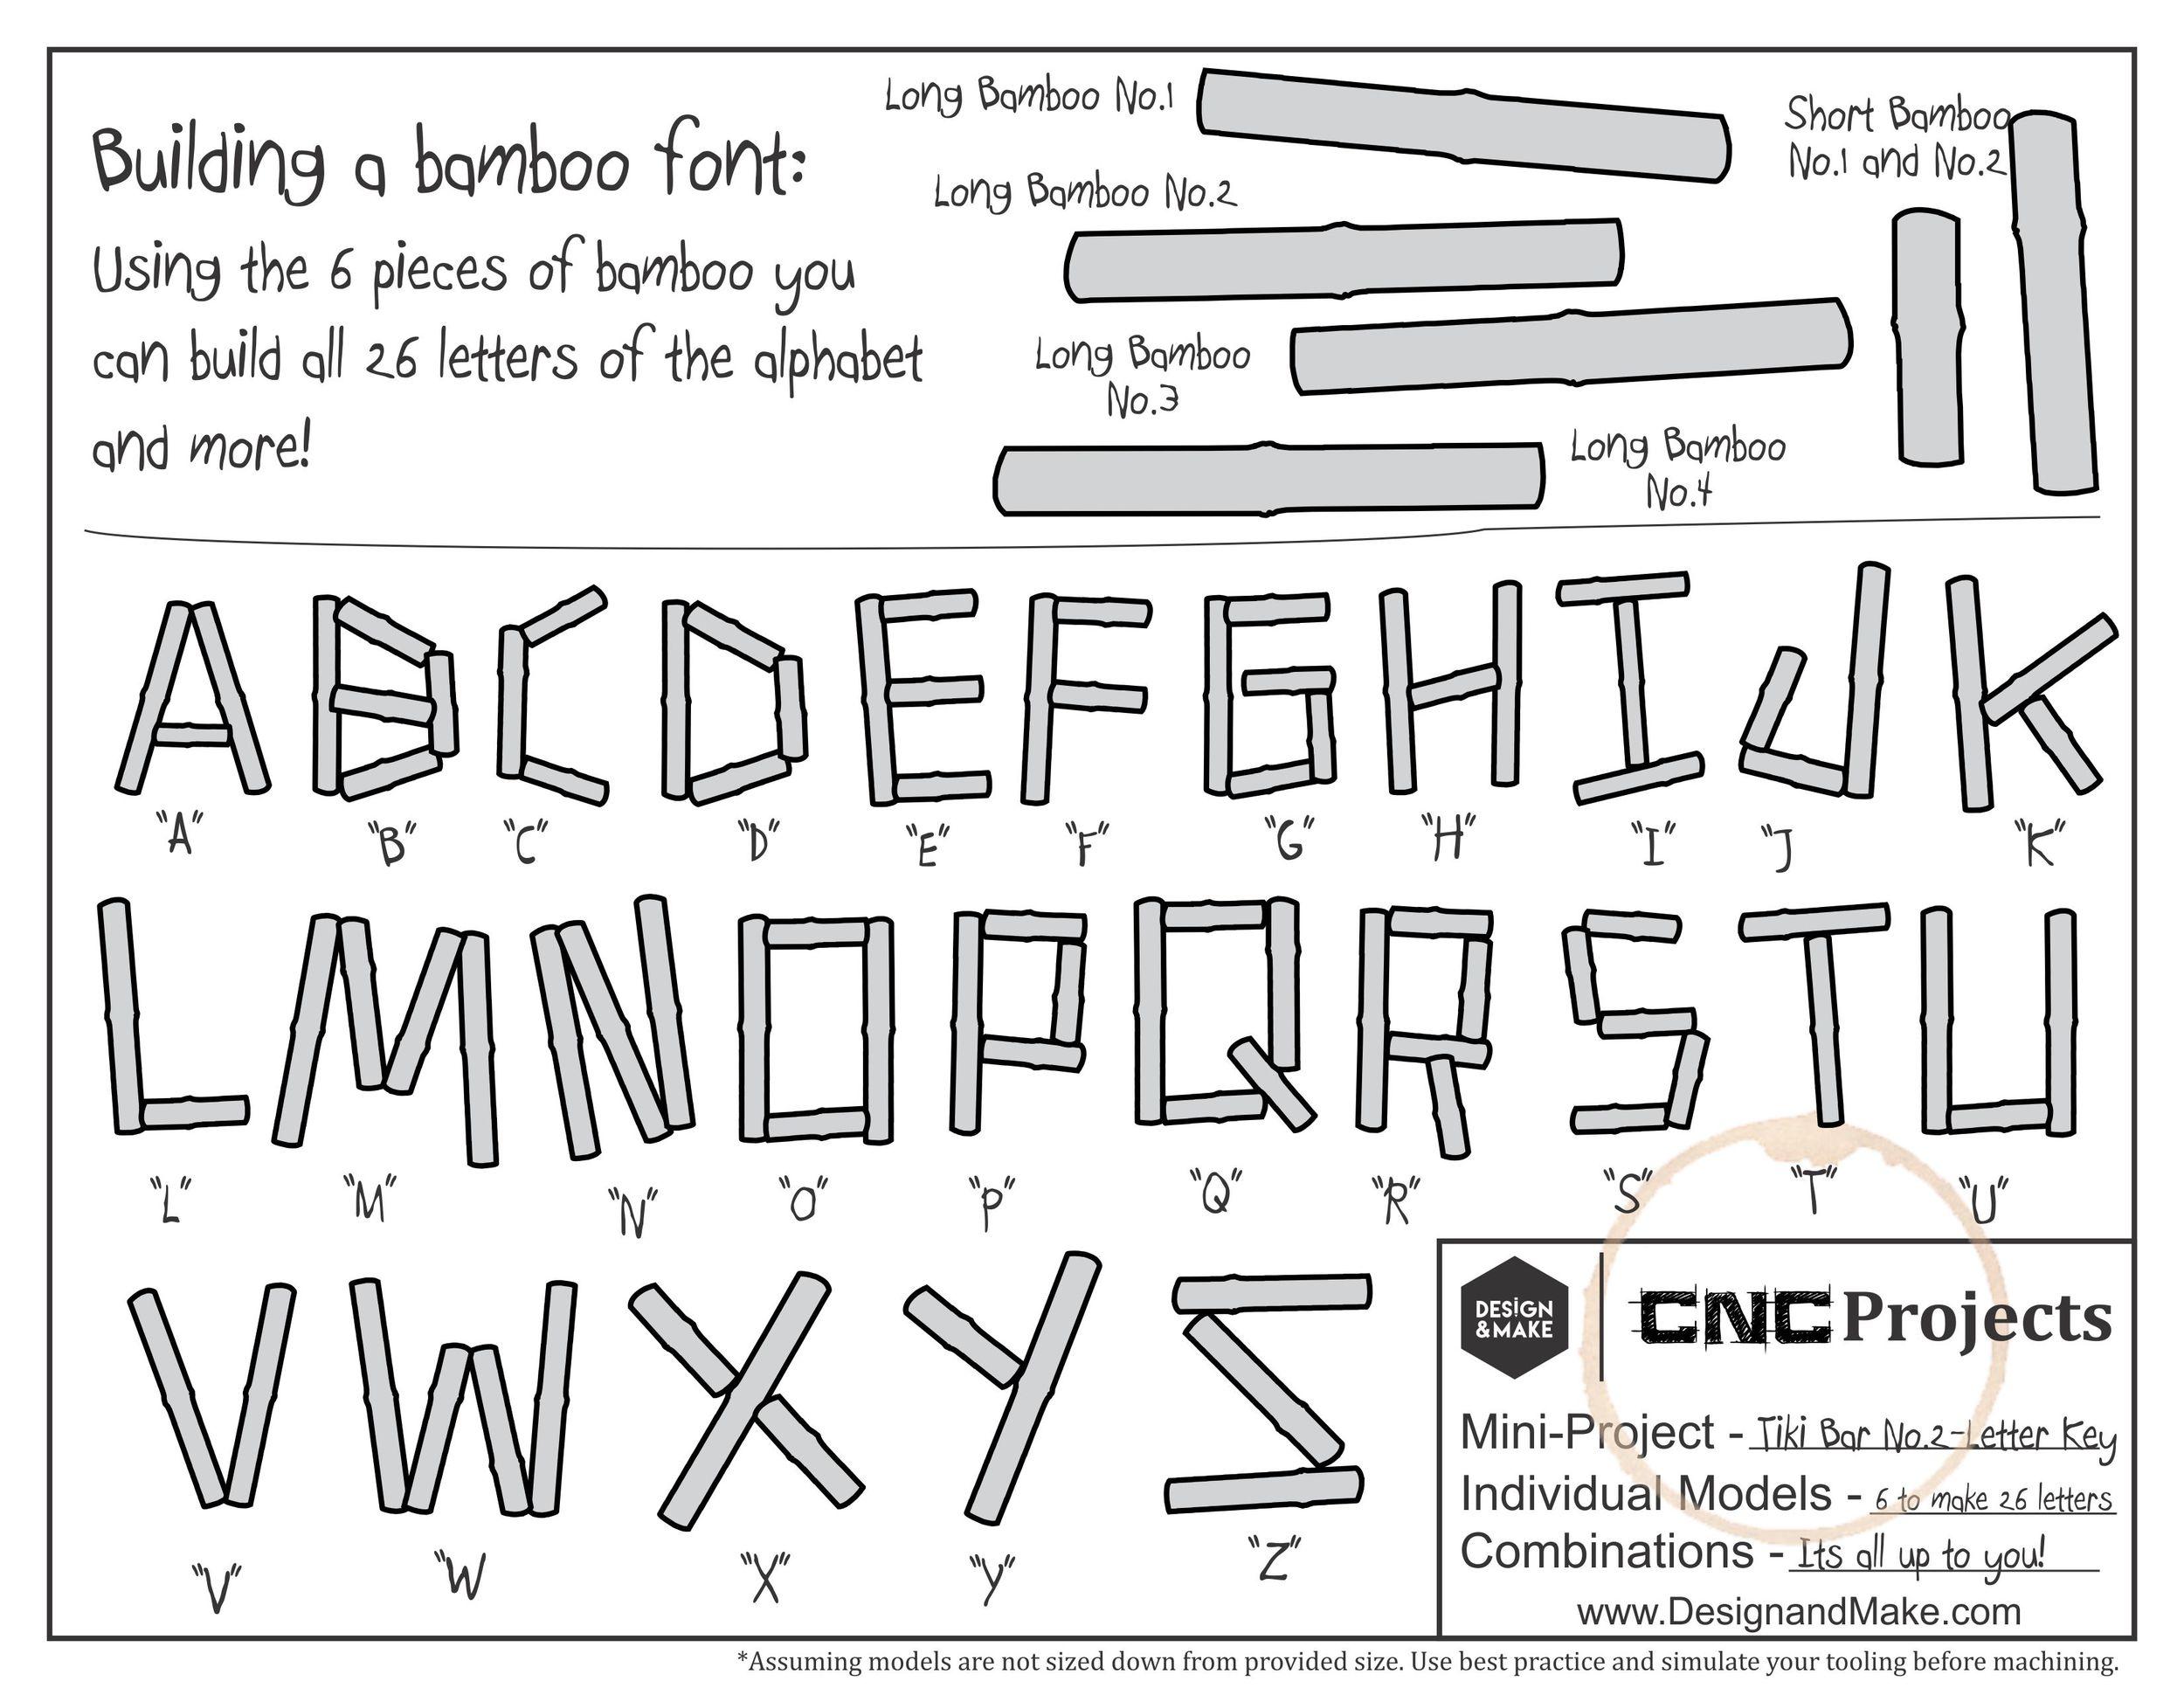 Letter Key - Click to enlarge